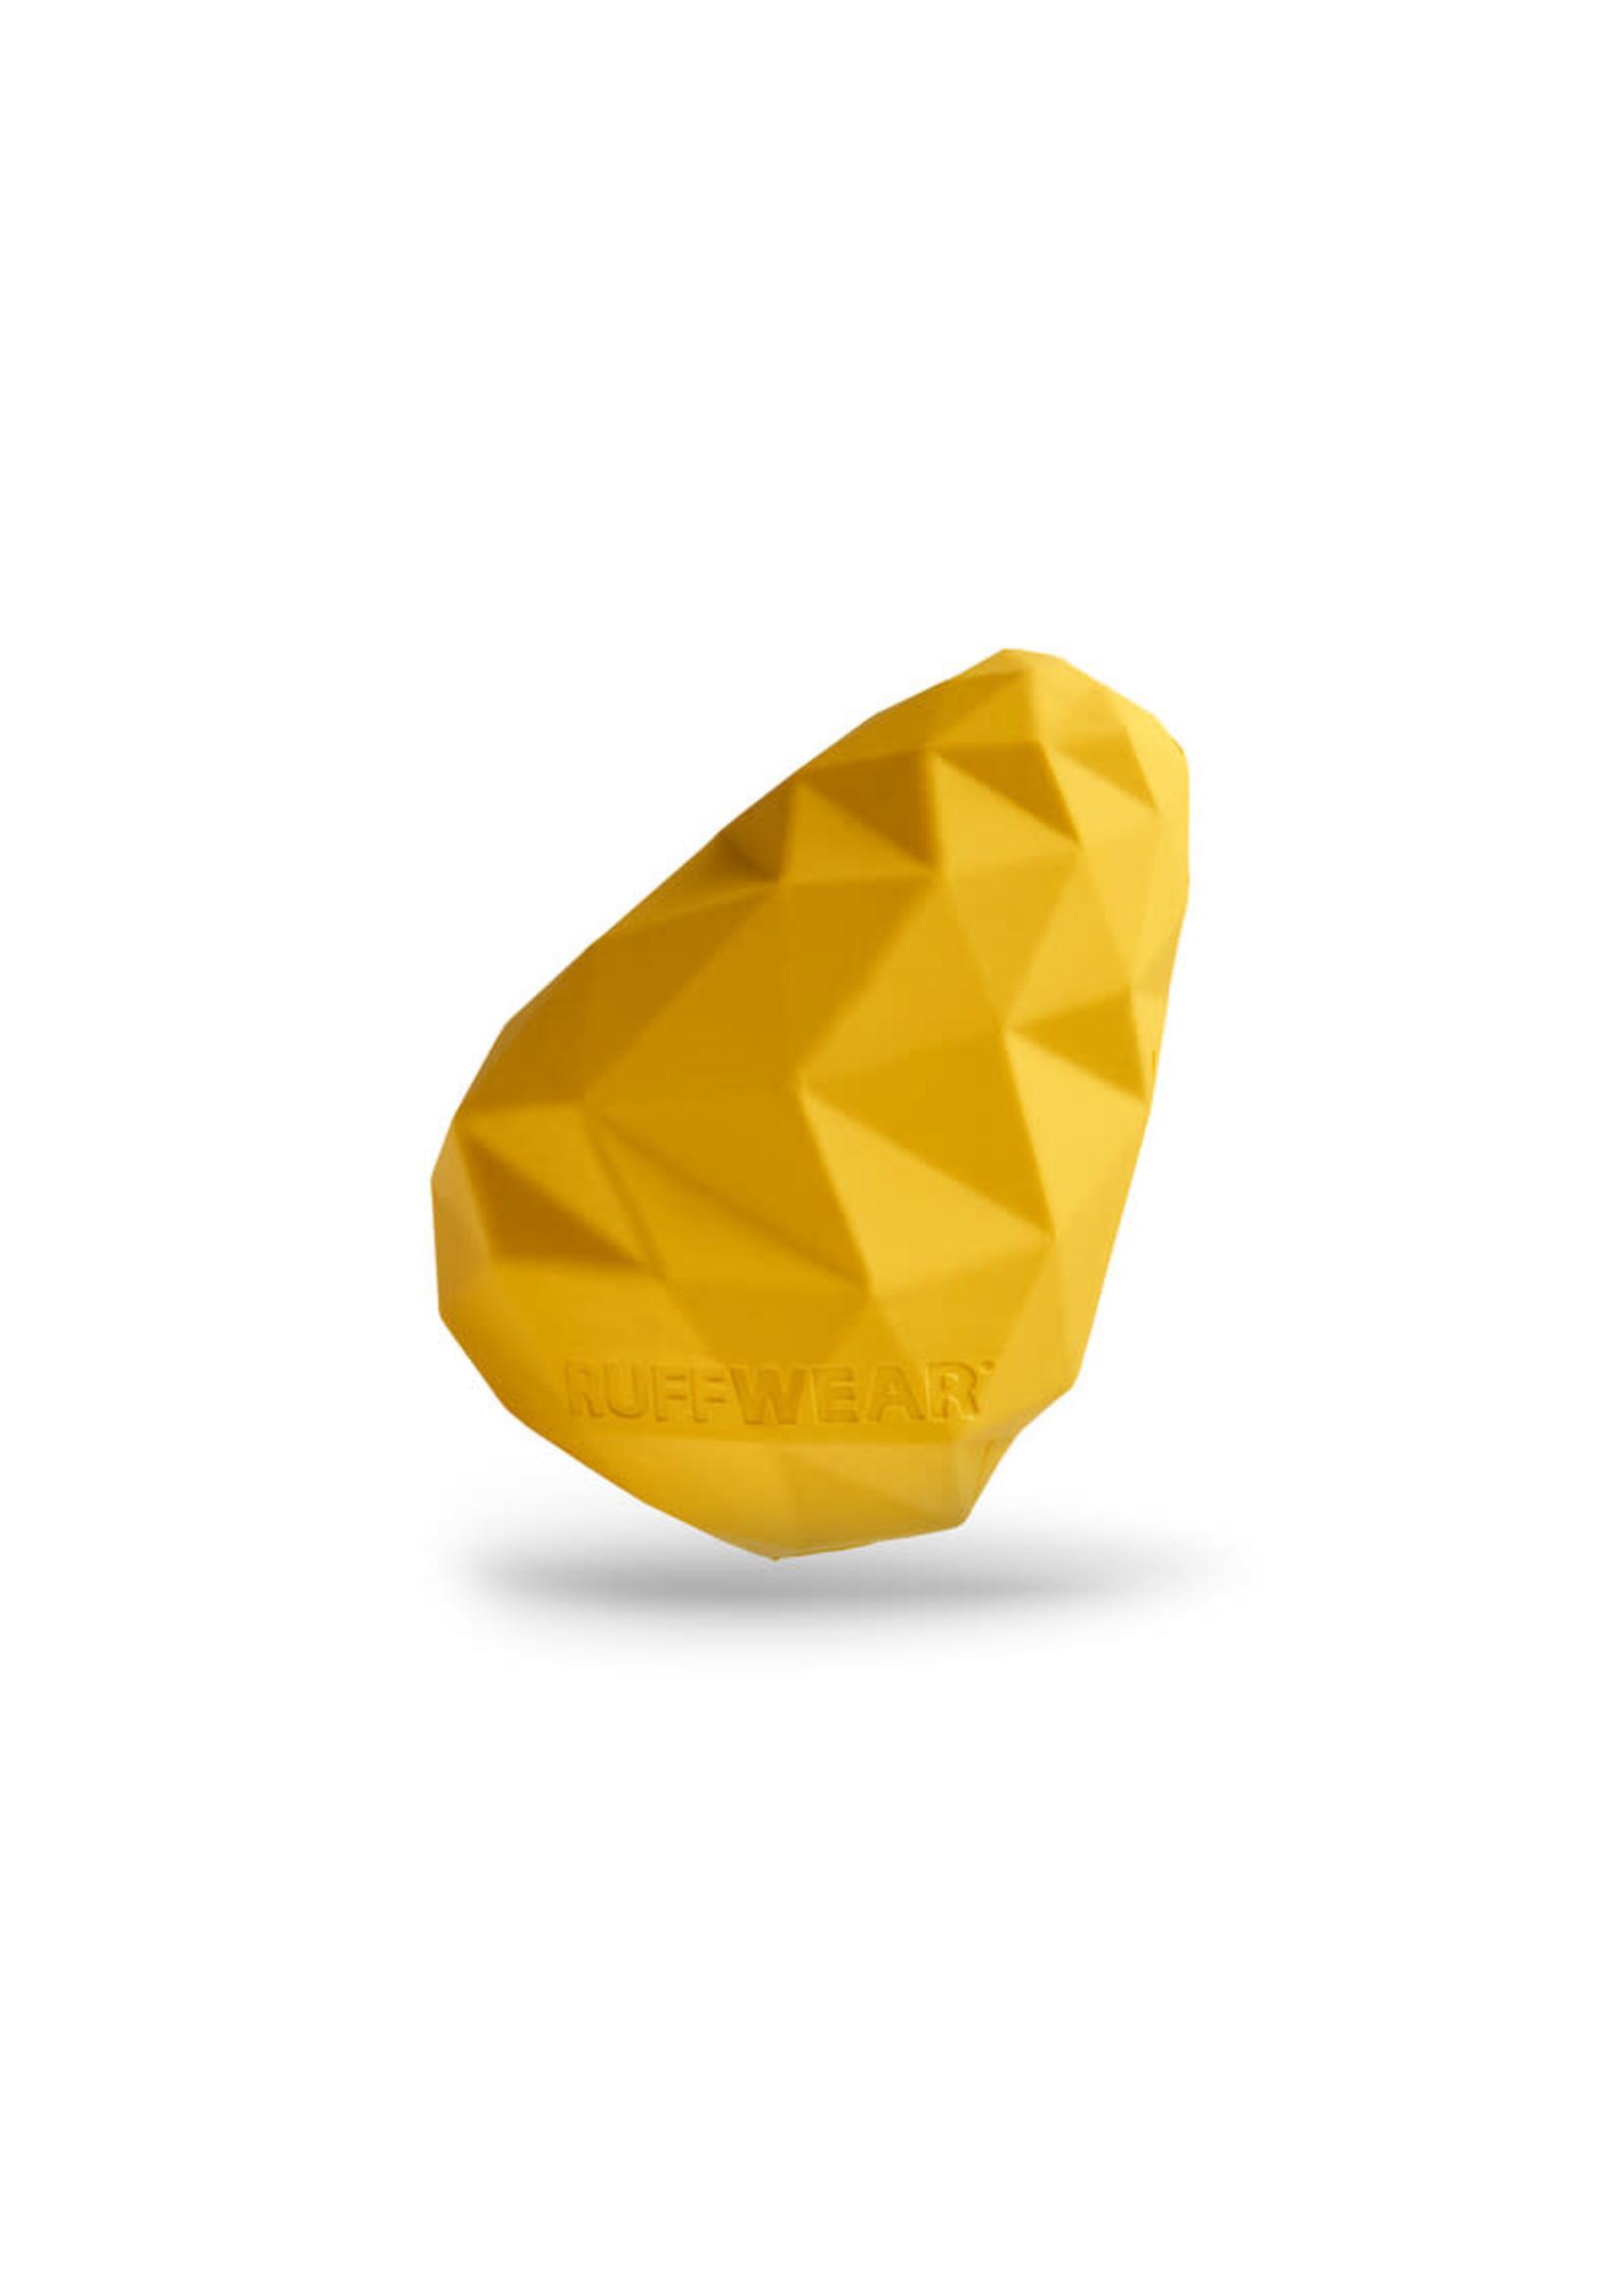 Ruffwear RW Gnawt A Cone Yellow